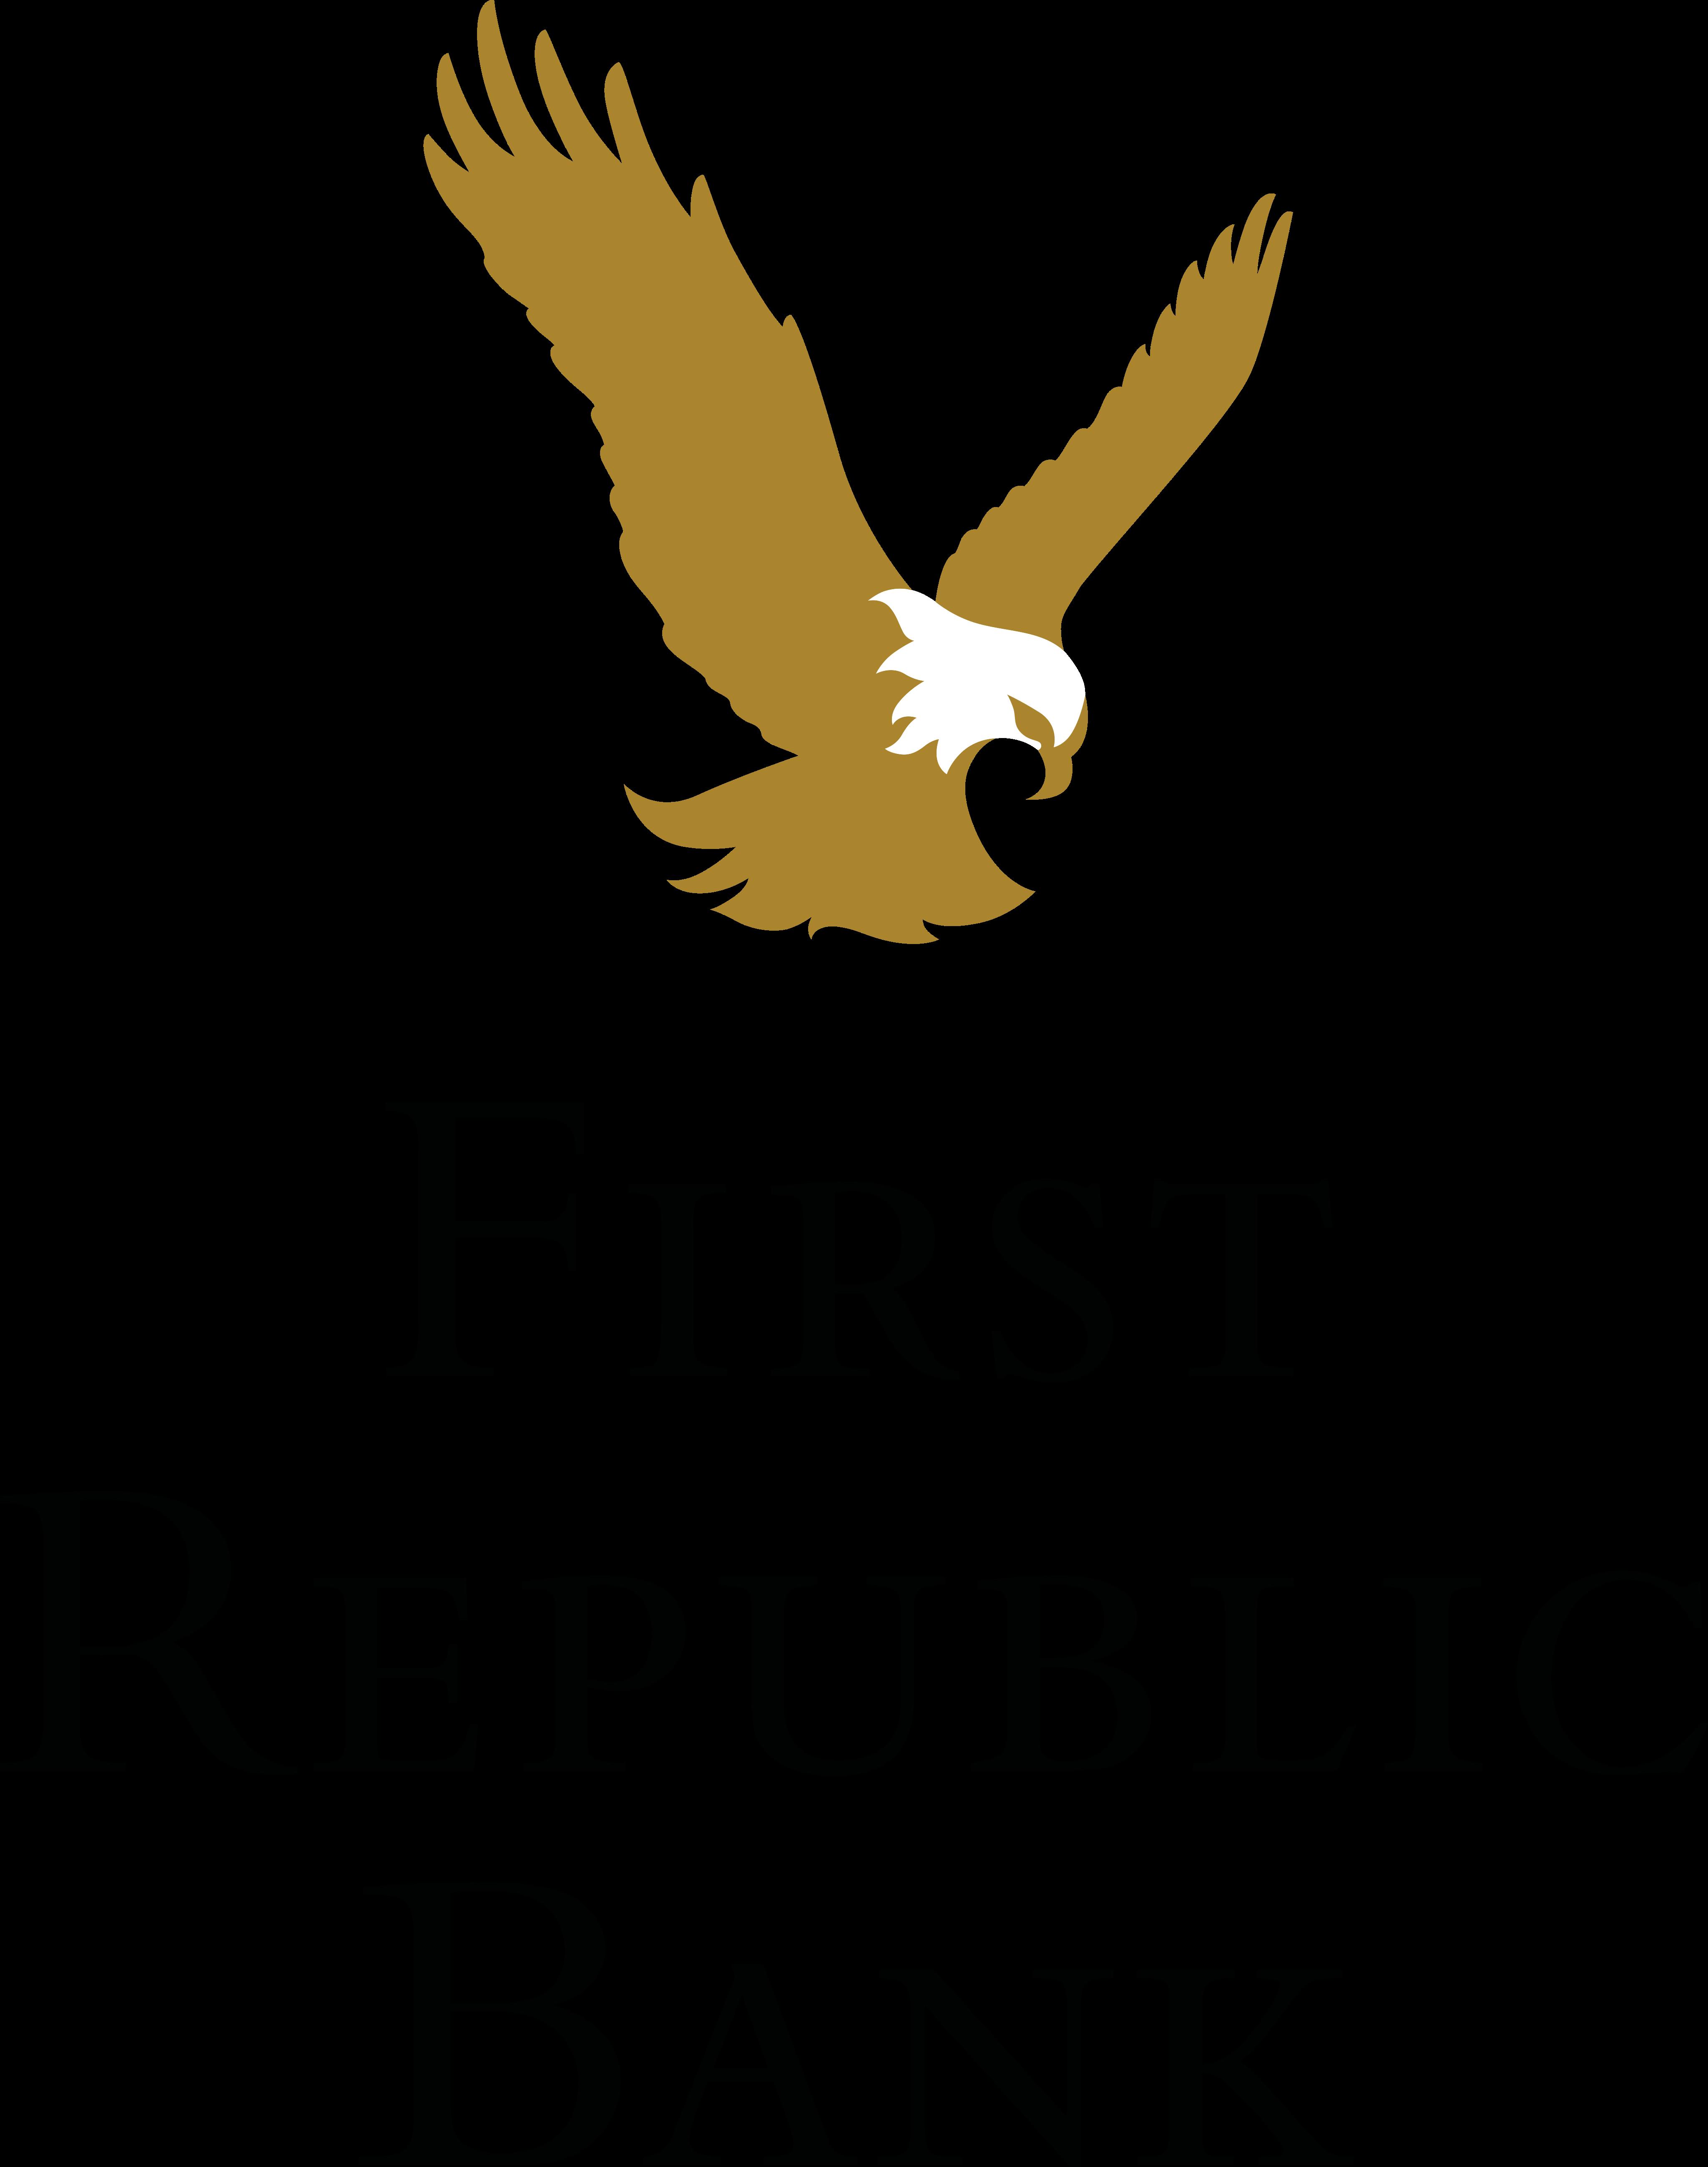 first republic bank logo 1 - First Republic Bank Logo